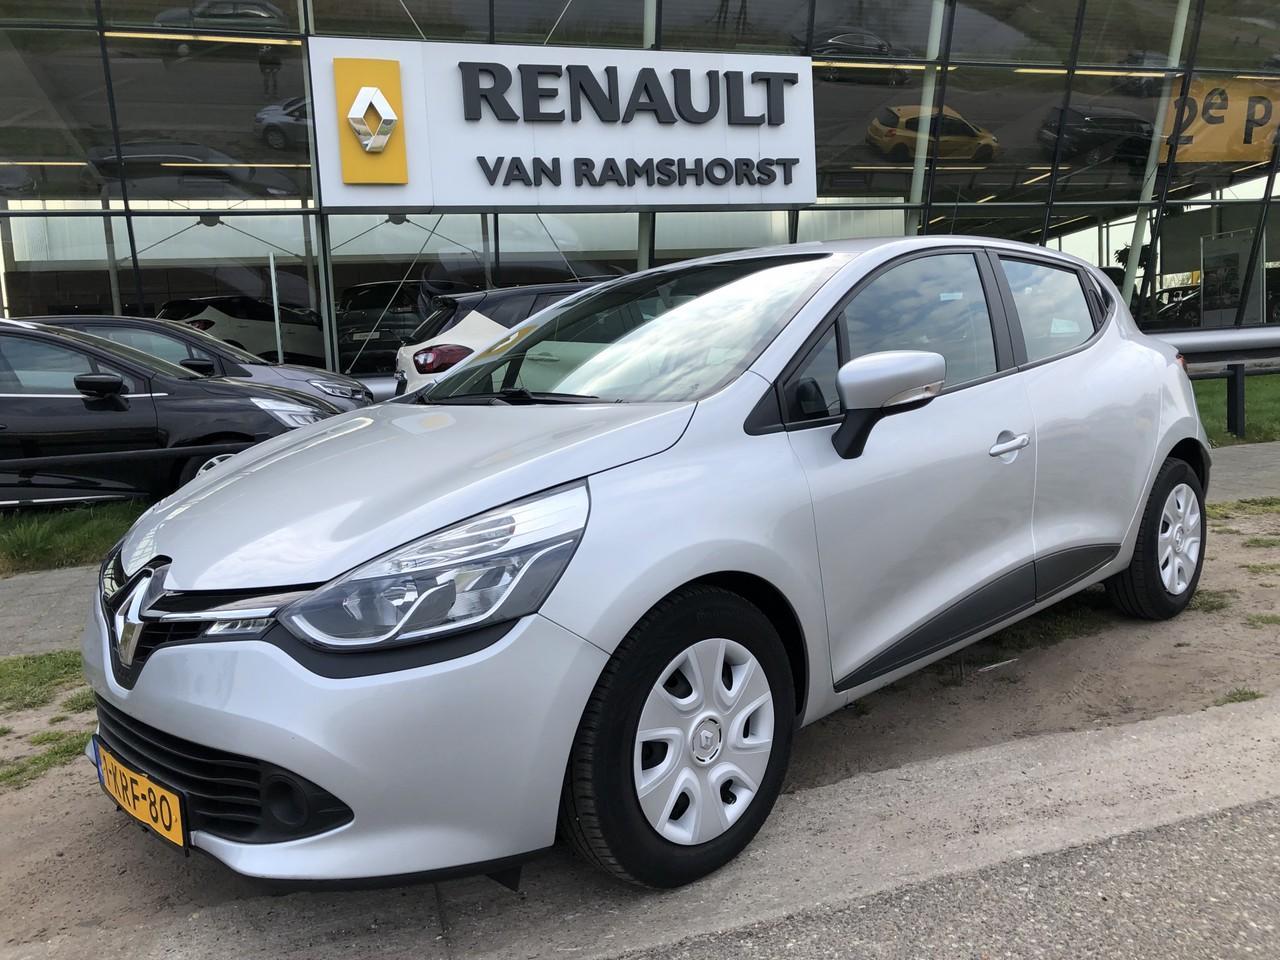 Renault Clio 0.9 tce 90pk expression airco medianav 2e paasdag open 10.00 - 17.00 uur